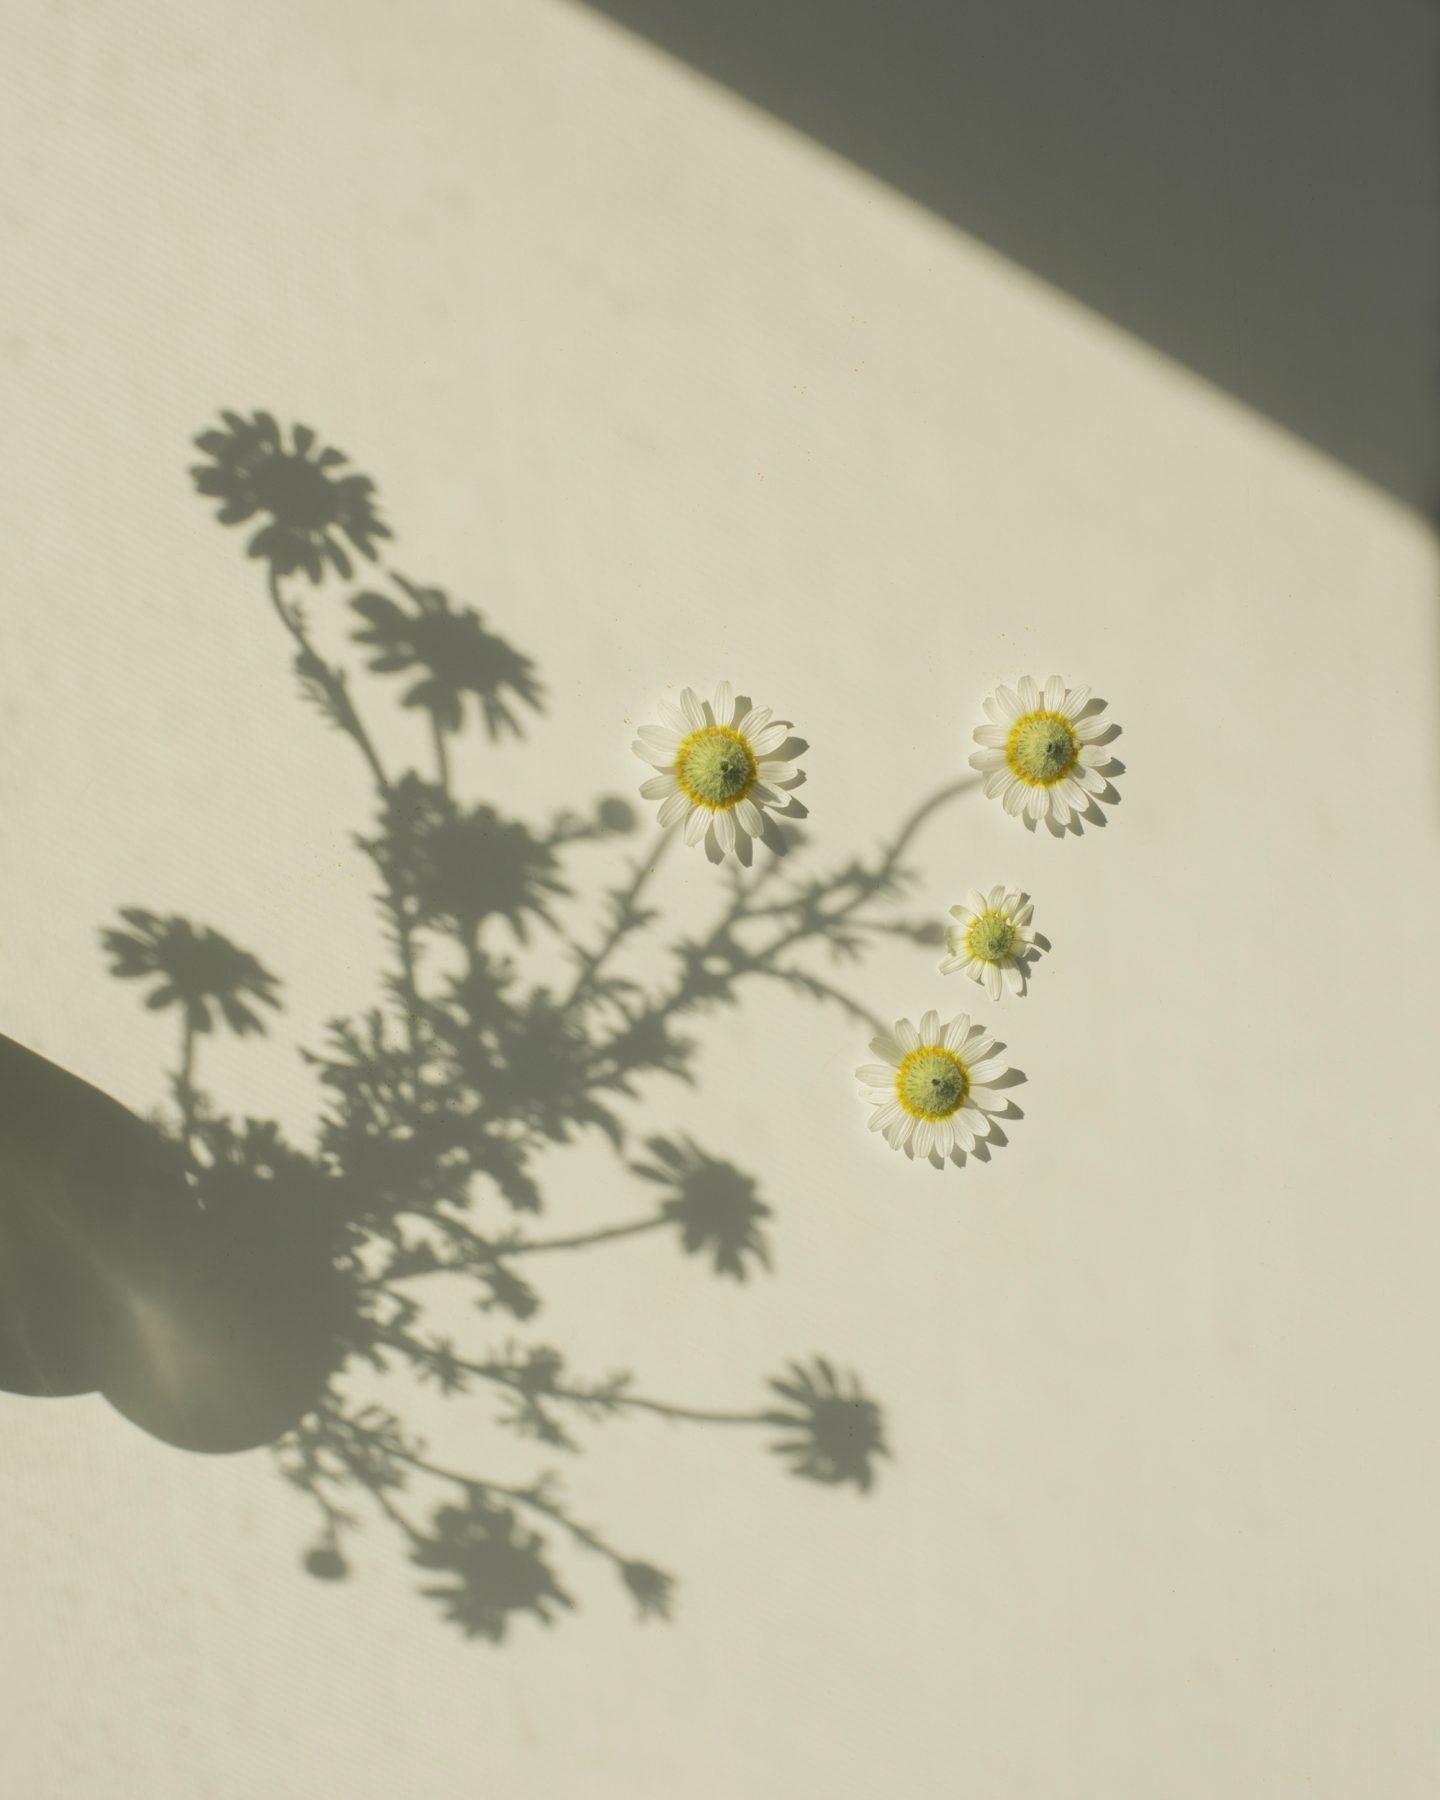 IGNANT-Photography-Varga-15